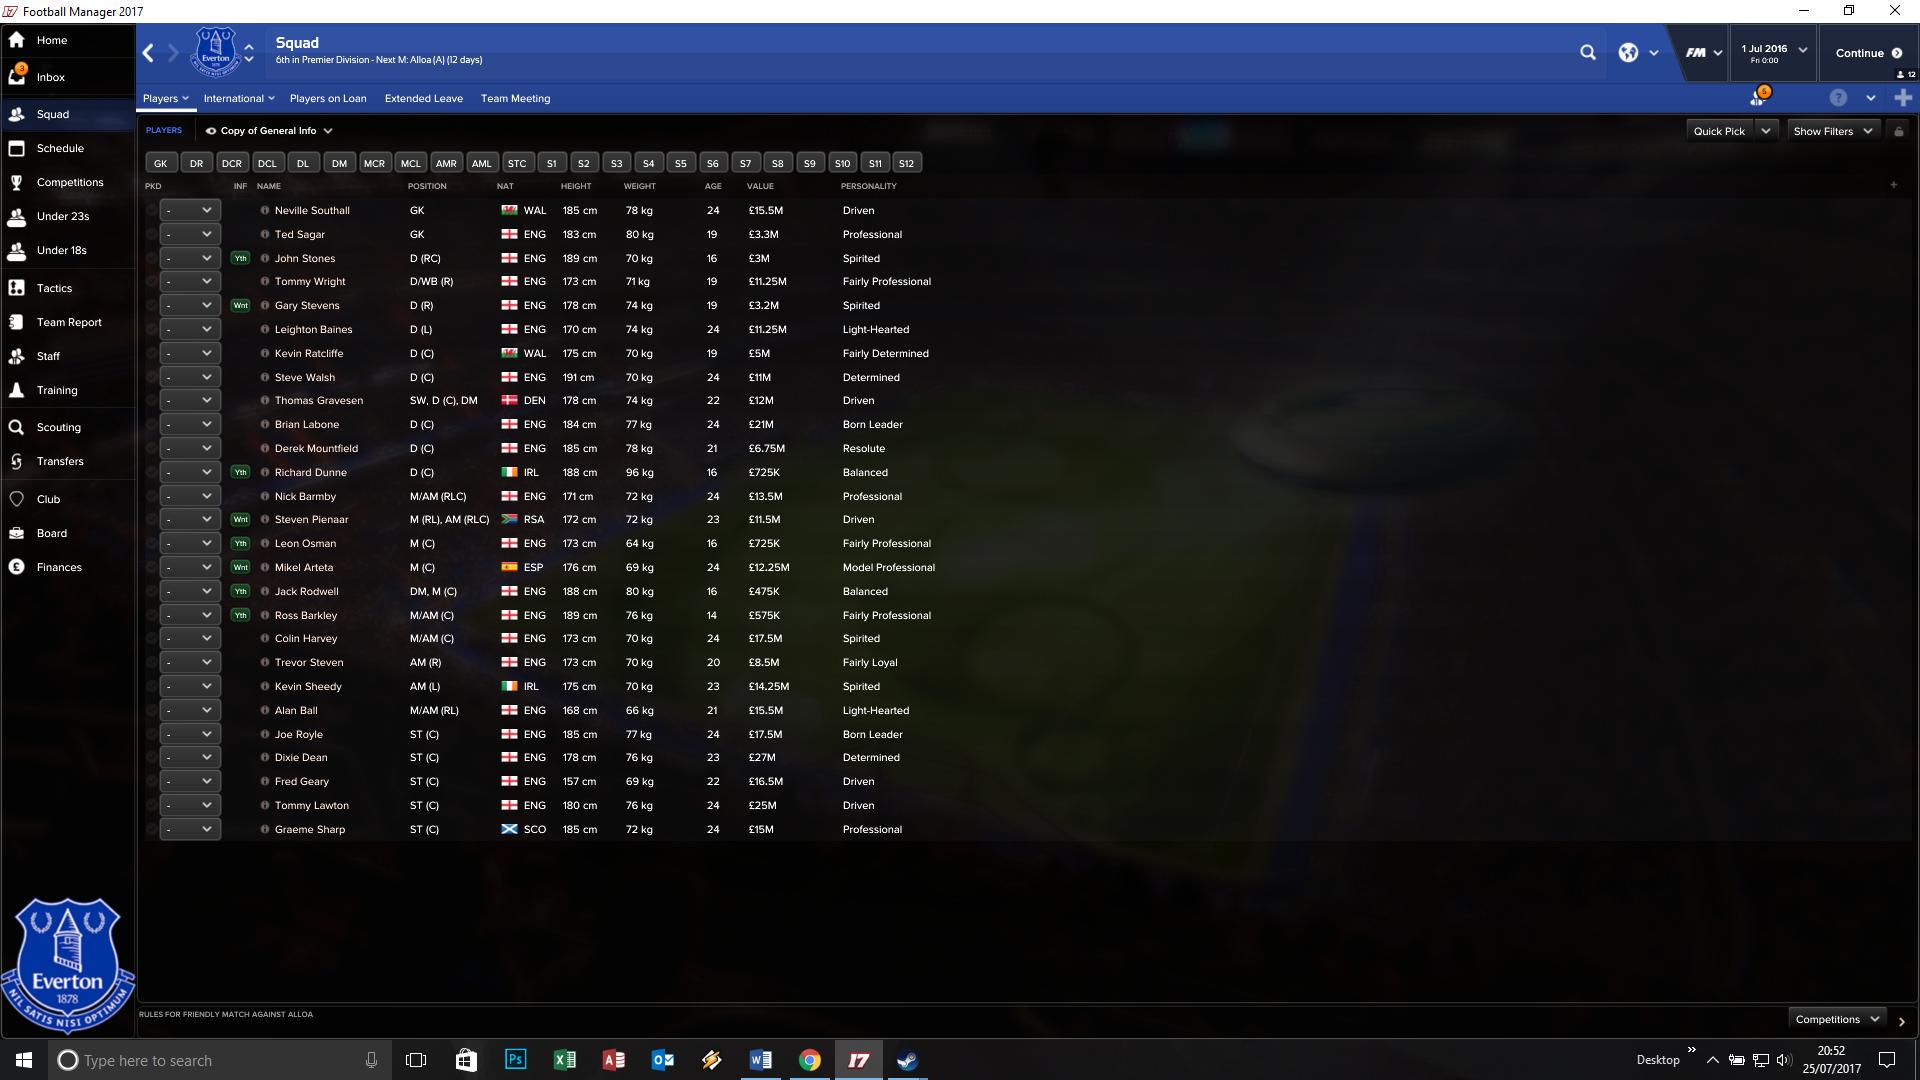 Everton_Squad.png